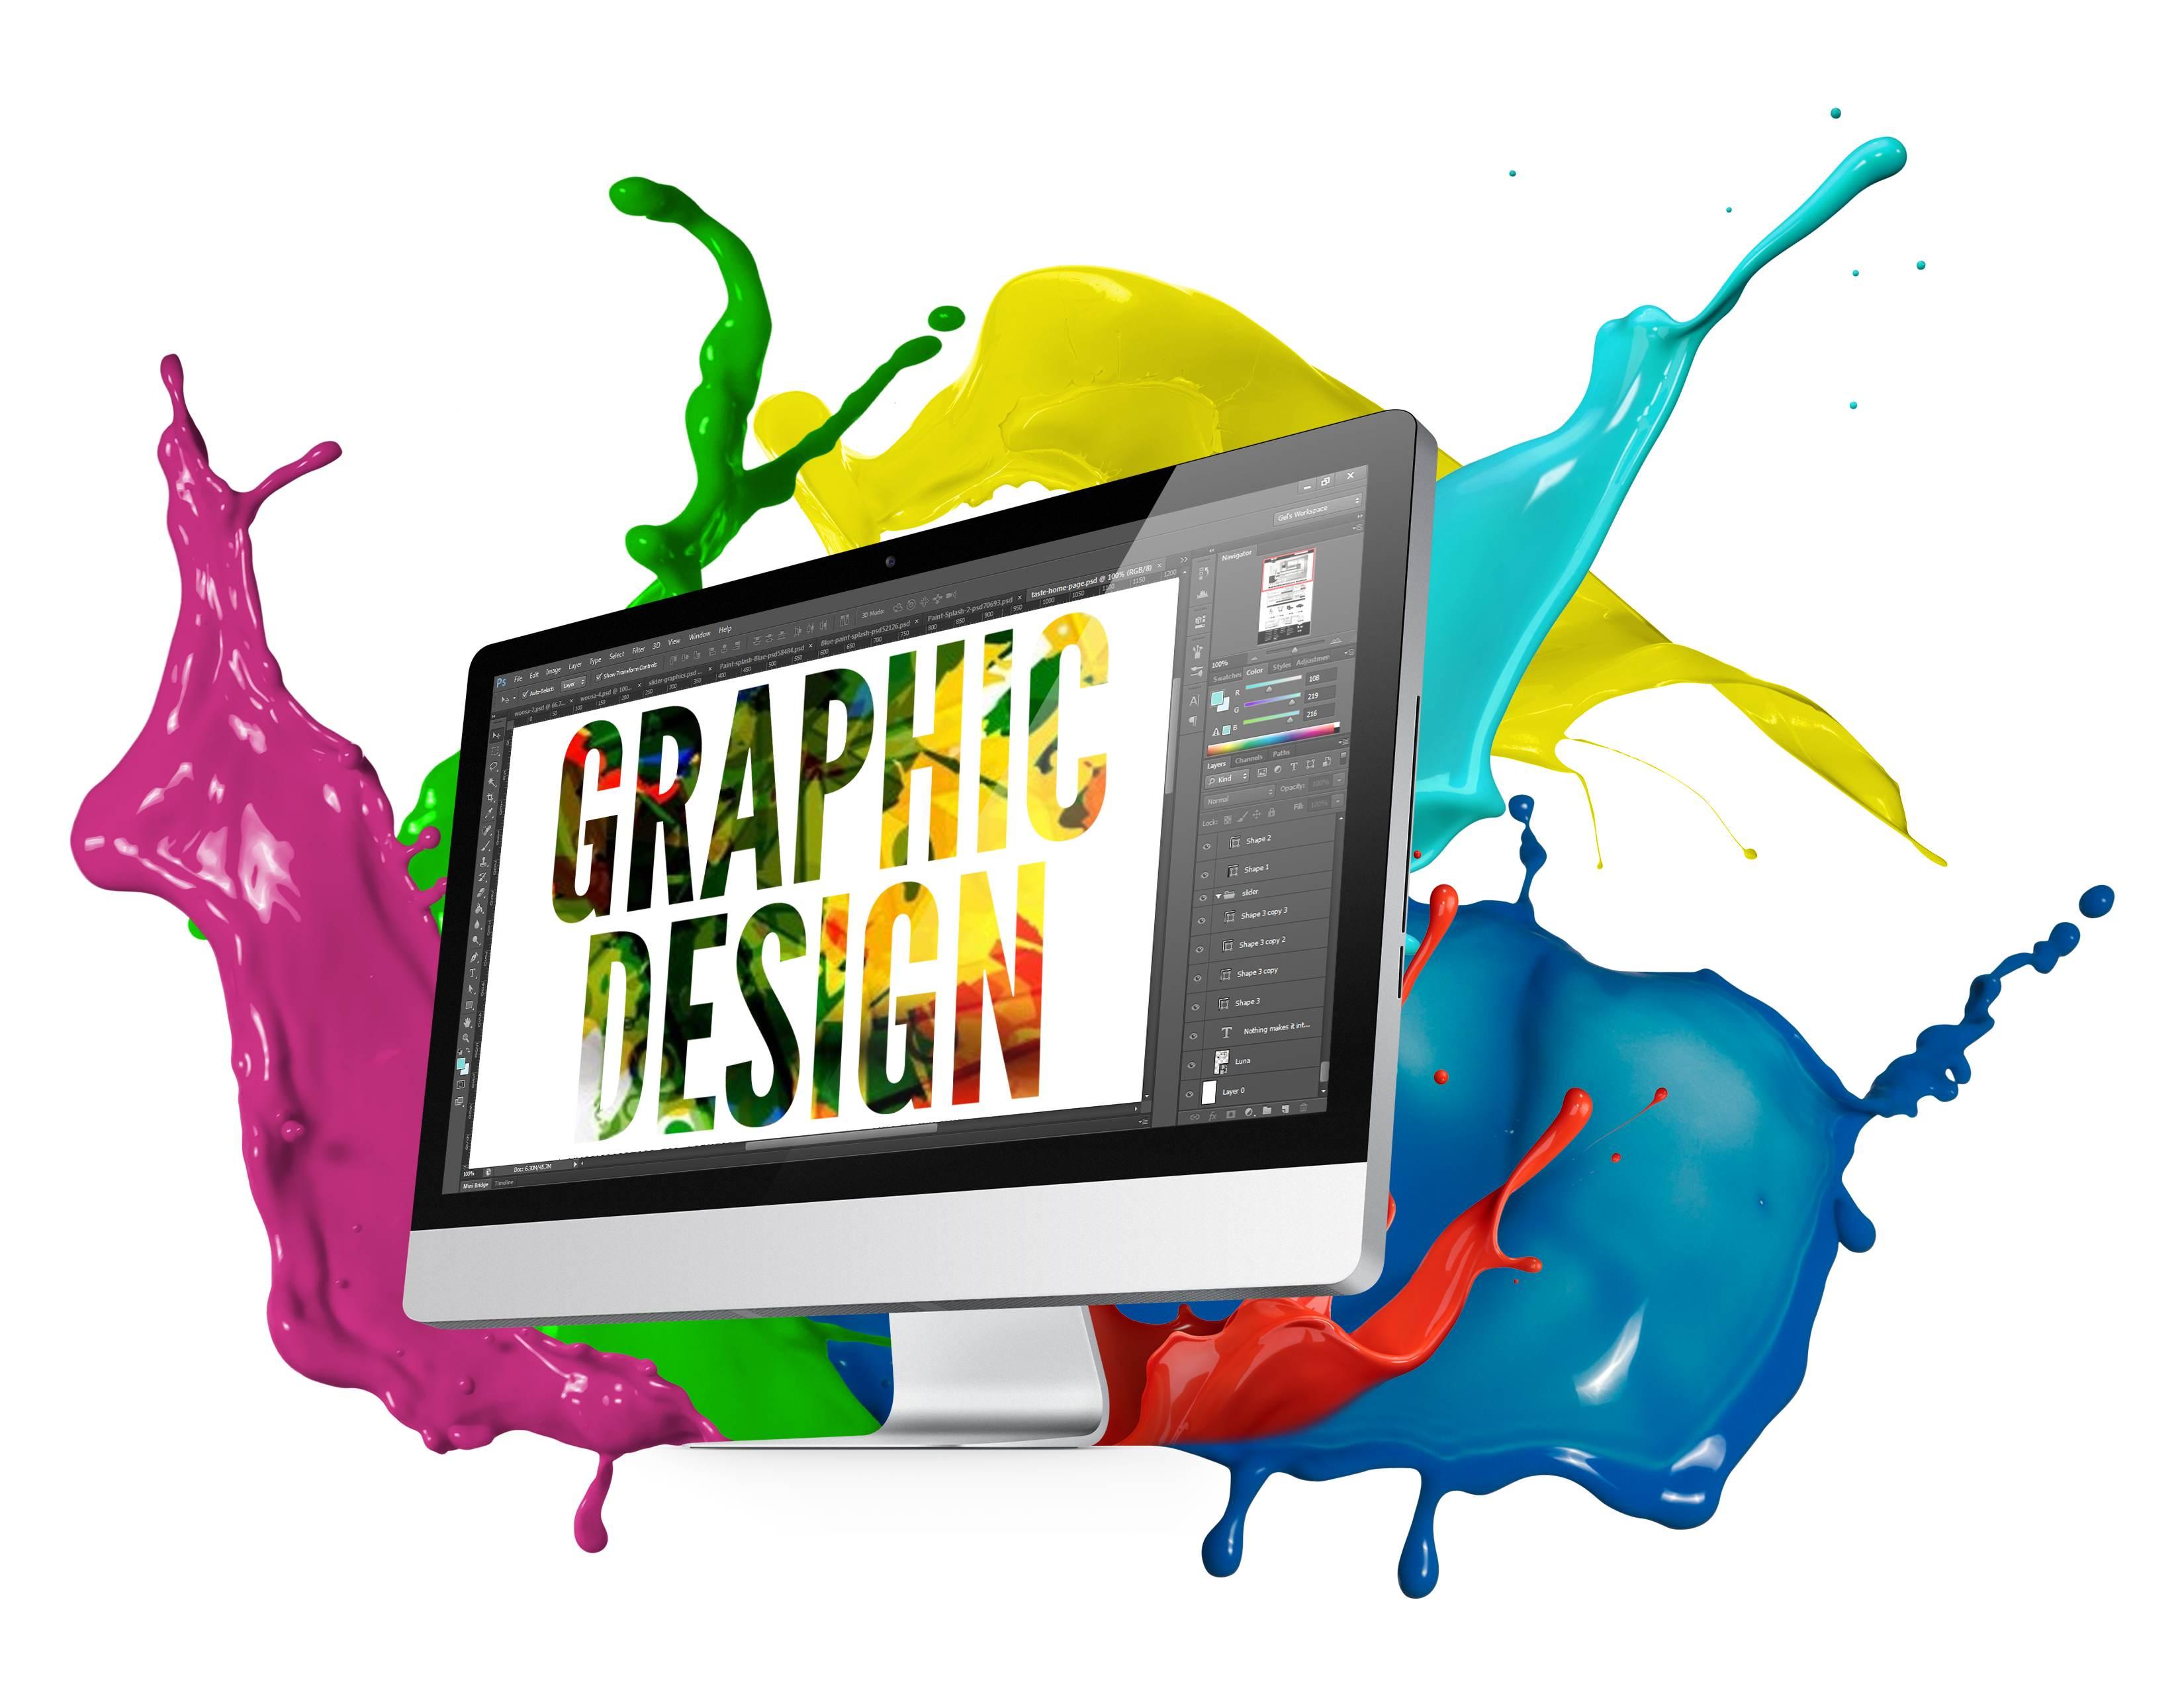 3300x2550 Graphic Design Clipart For Macs